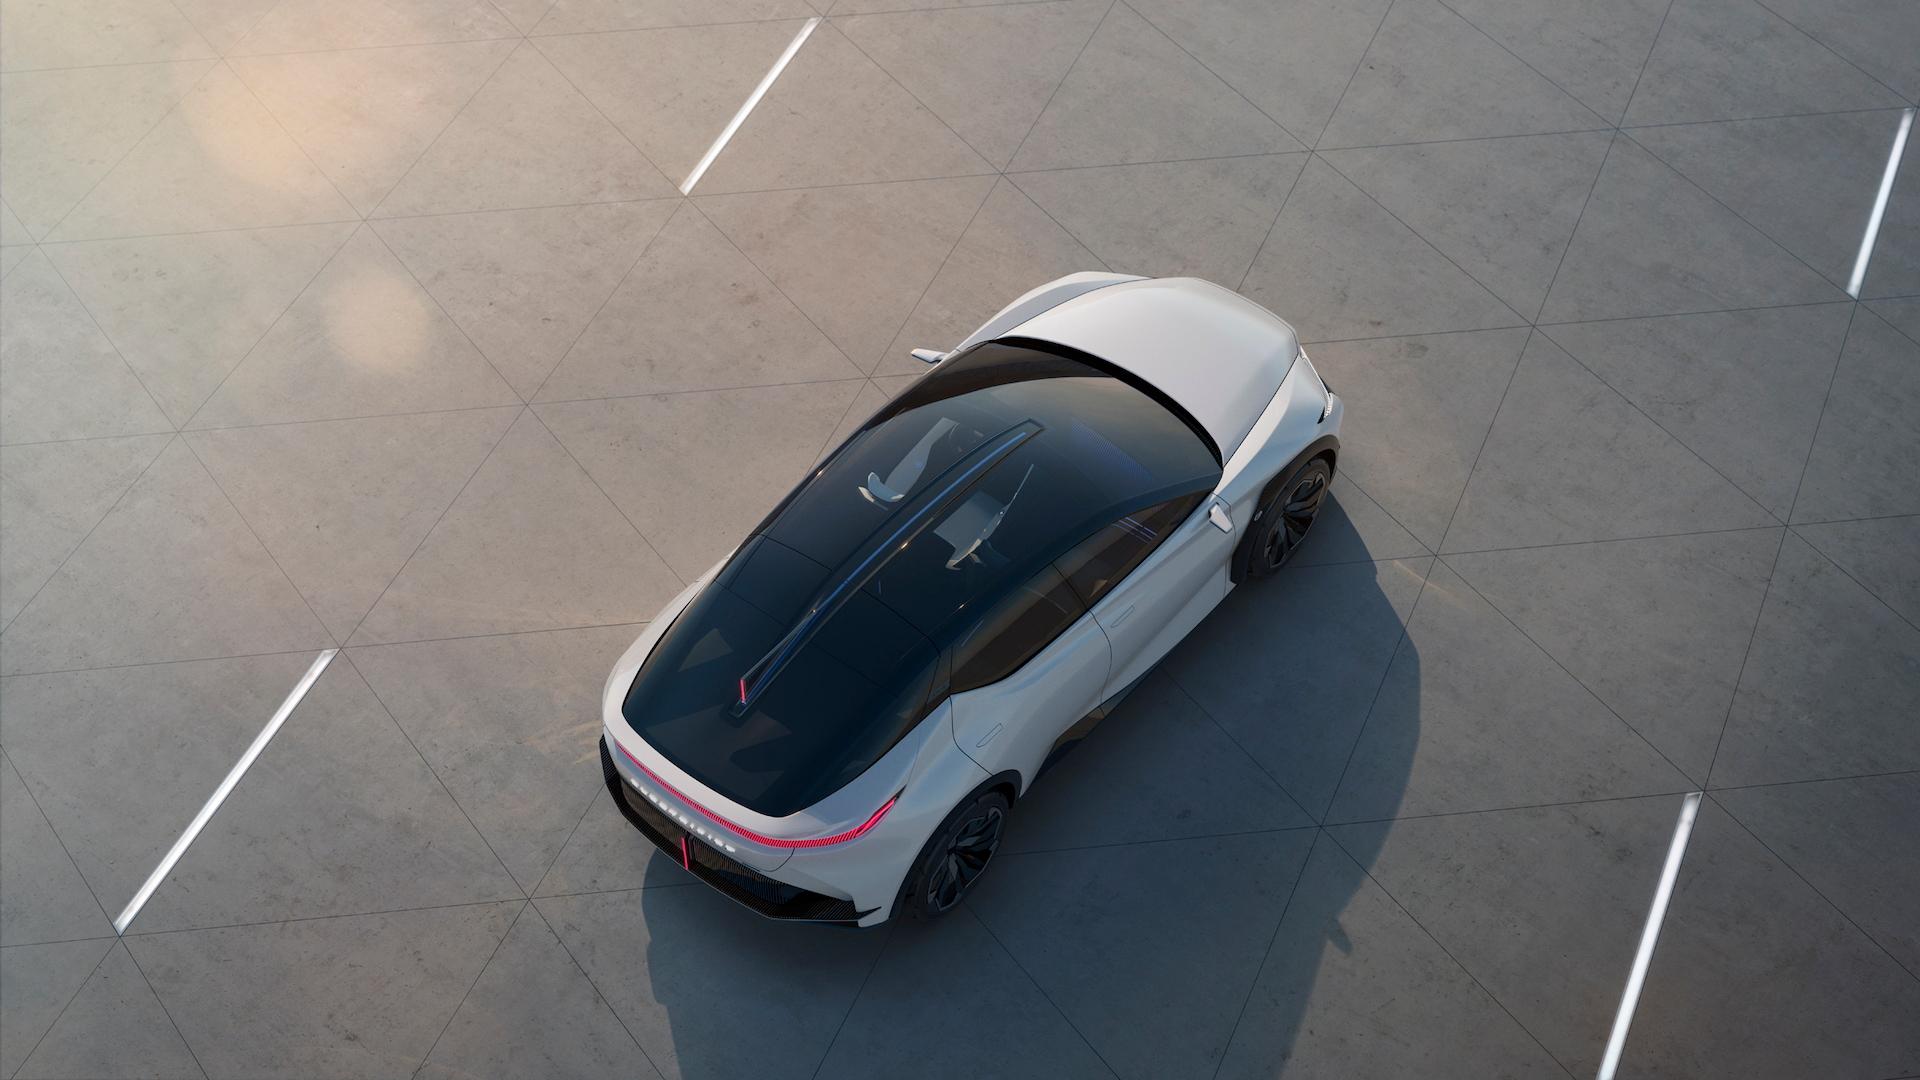 Lexus LF-Z Electrified concept